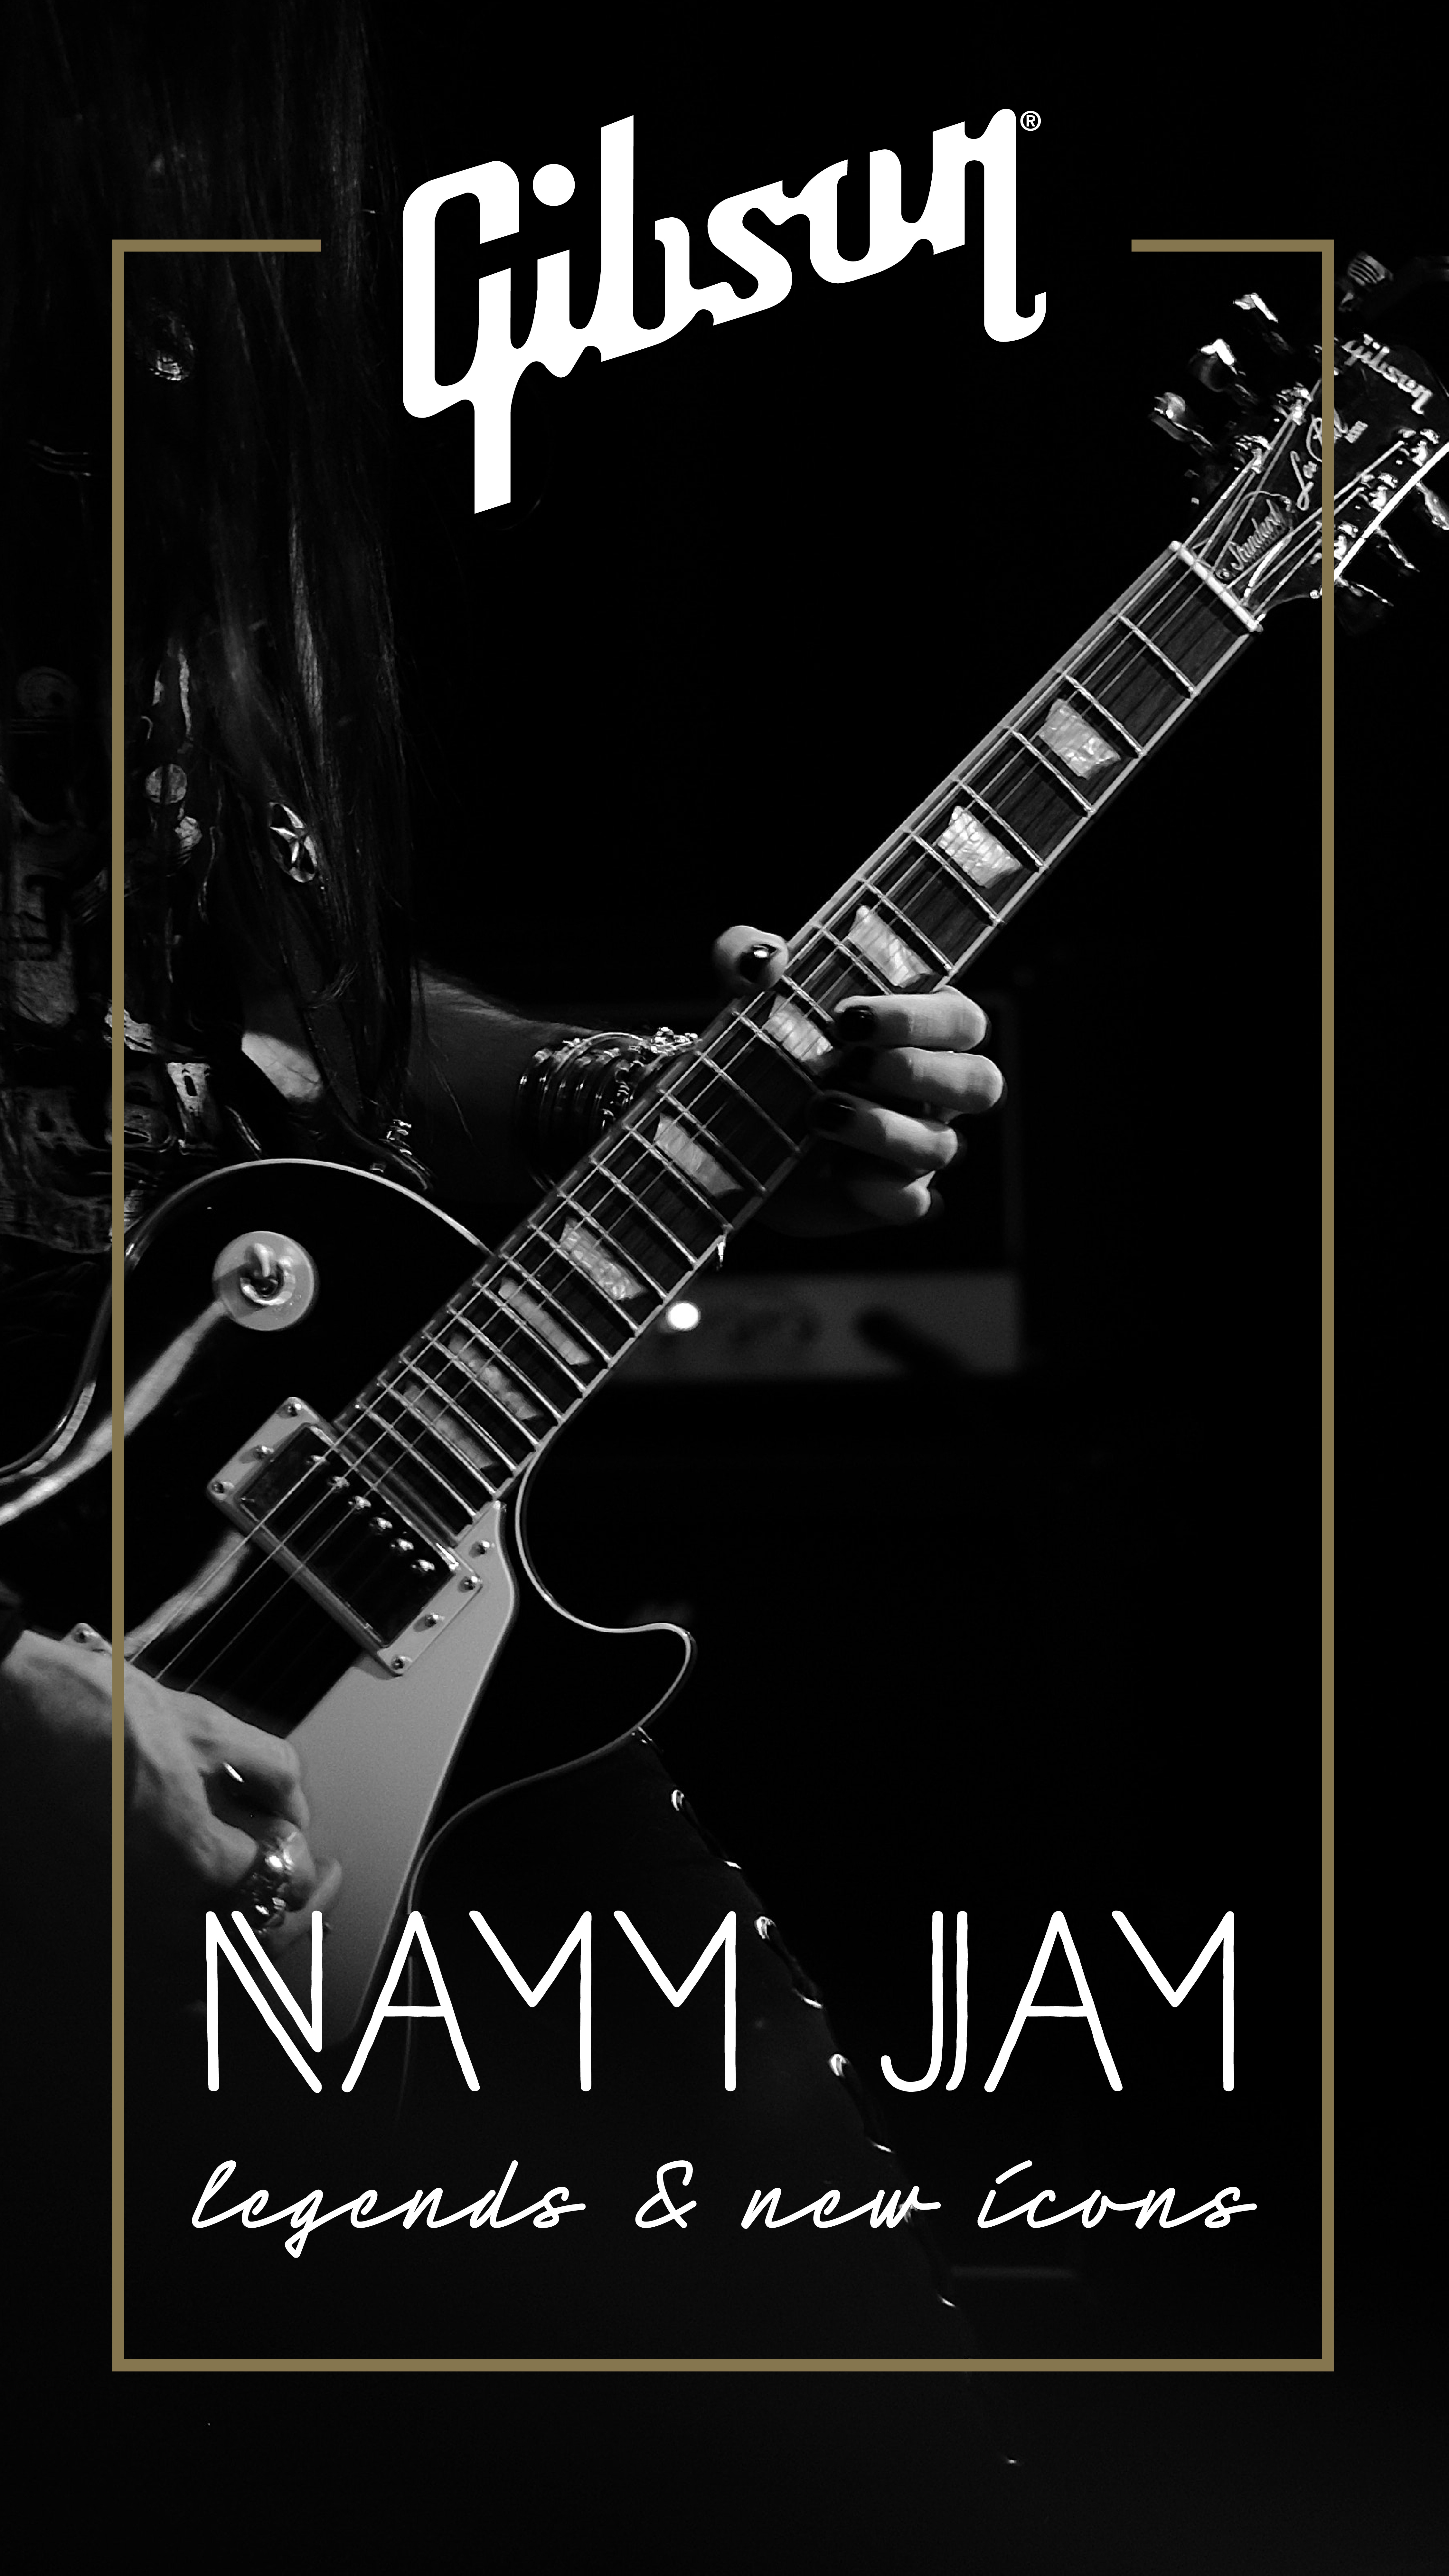 Gibson at NAMM Jamm